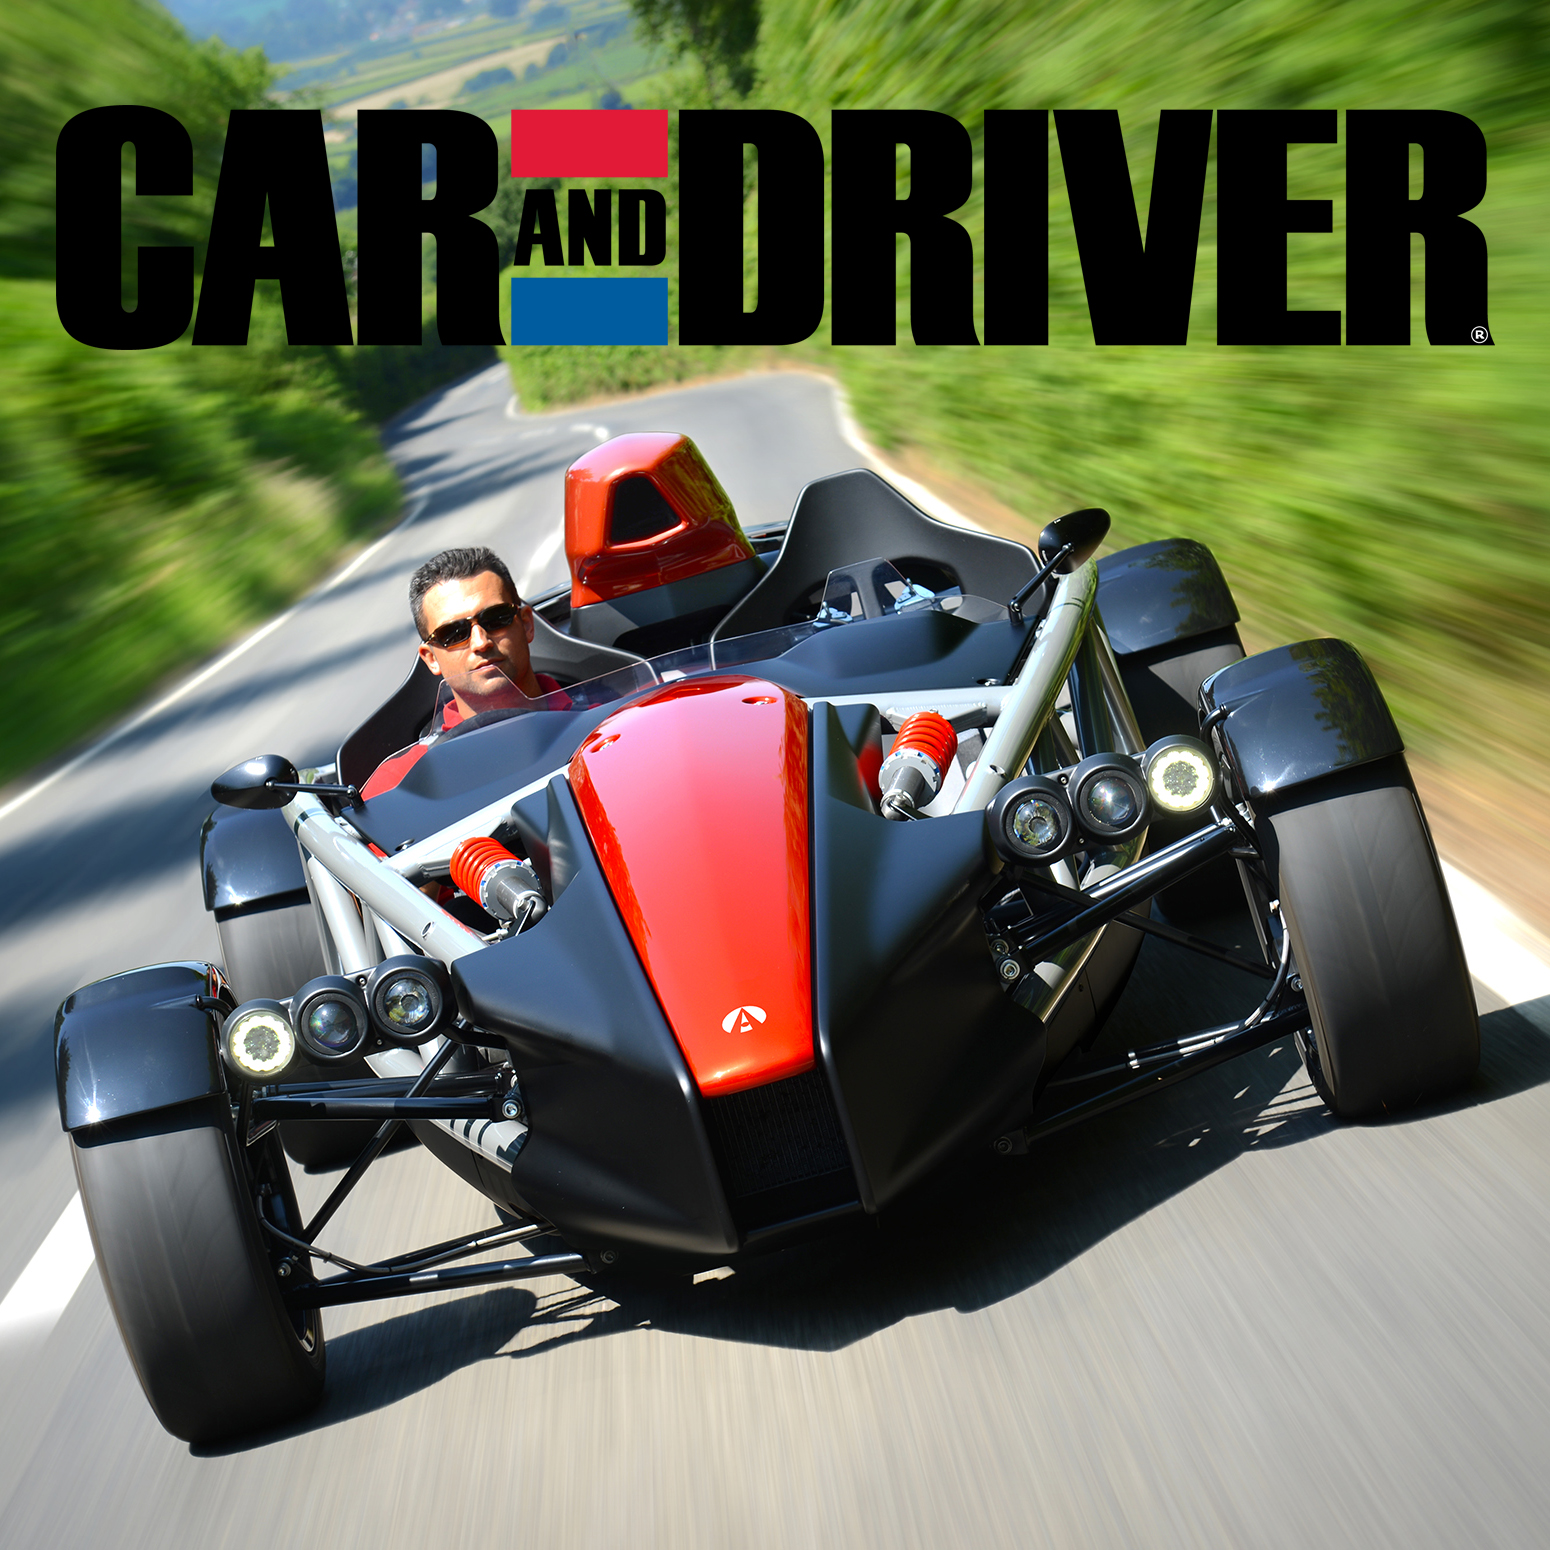 Ariel_Atom_4_Car&Driver.jpg